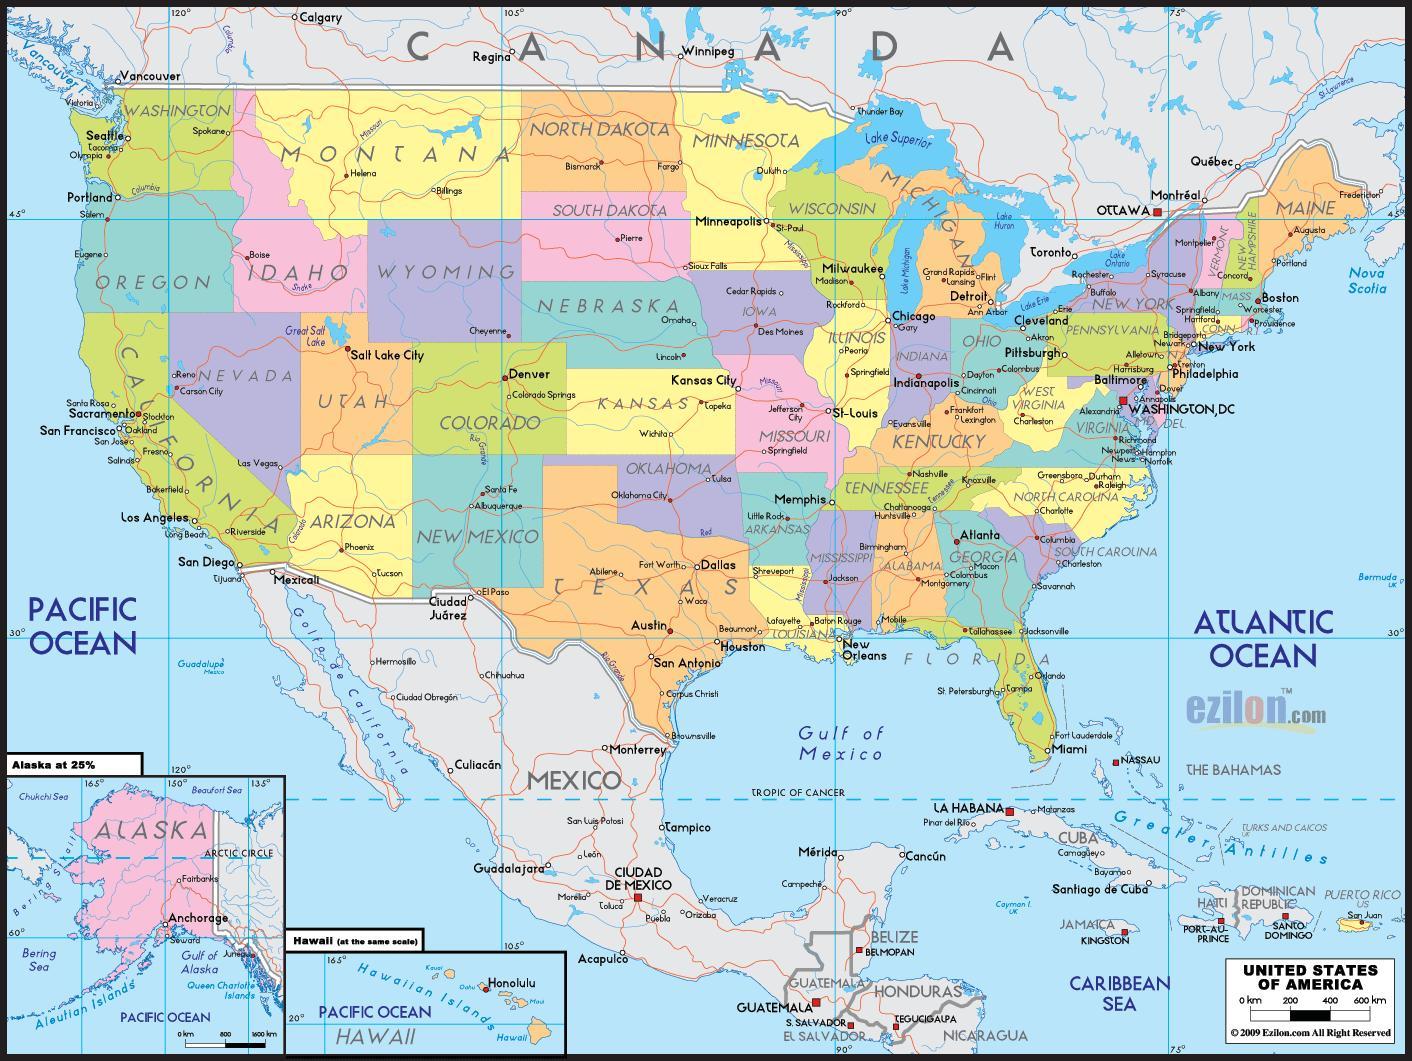 mapa amerike Mapa Ameriku NAS u Americi mapu (Sjevernoj Americi   Americi) mapa amerike